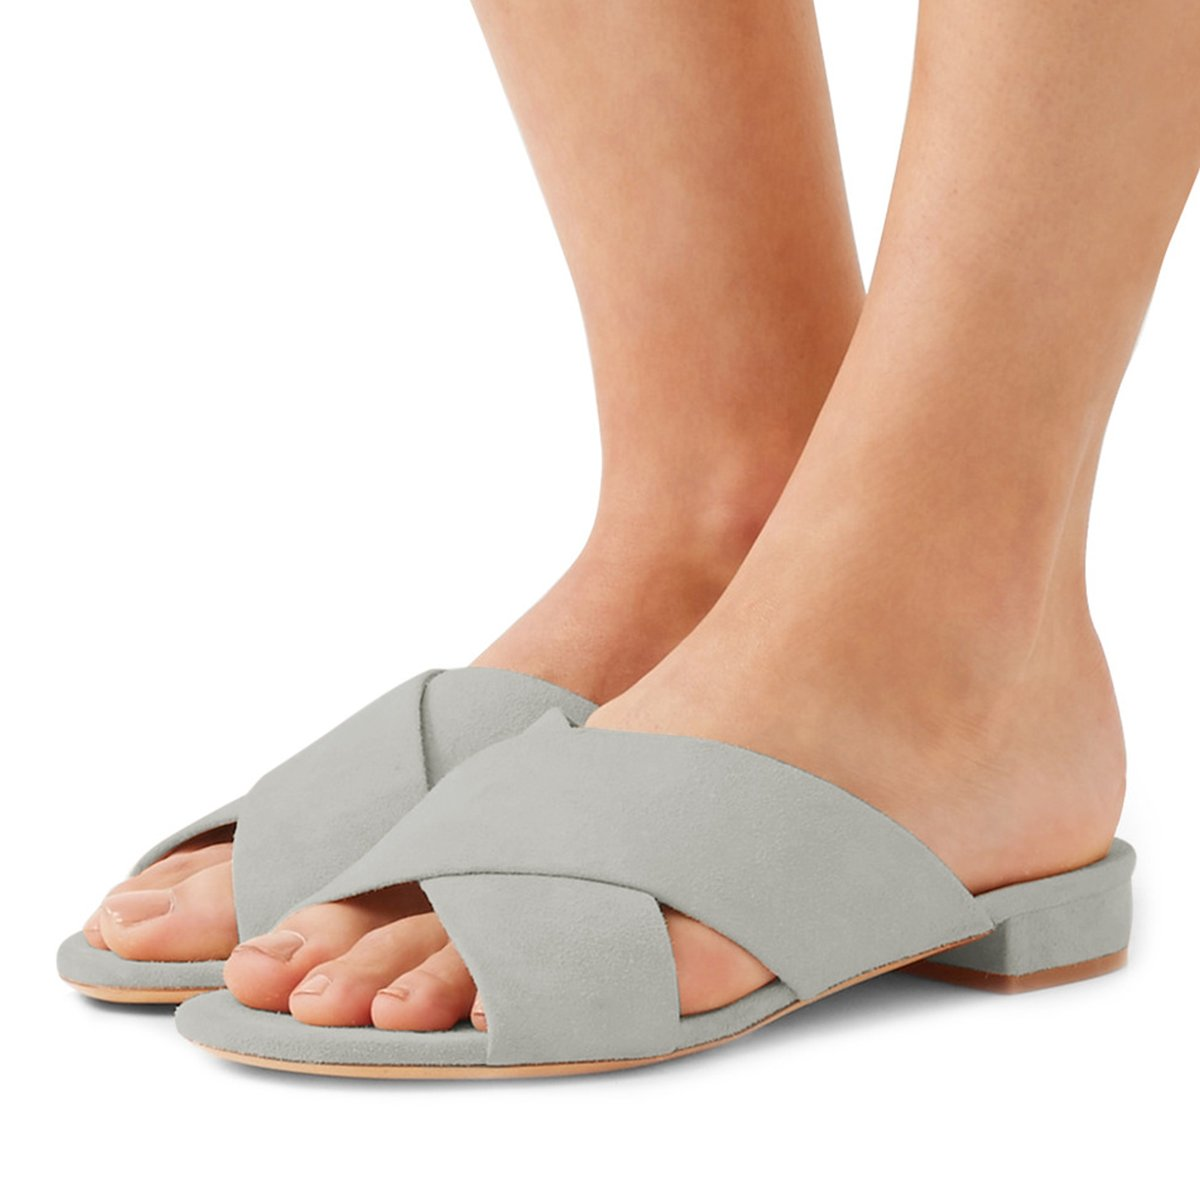 FSJ Women Comfortable Cross Strap Sandals Low Heels Mules Slide Casual Flats Shoes Size 4-15 US B07CTFVVJ7 9 B(M) US|Grey